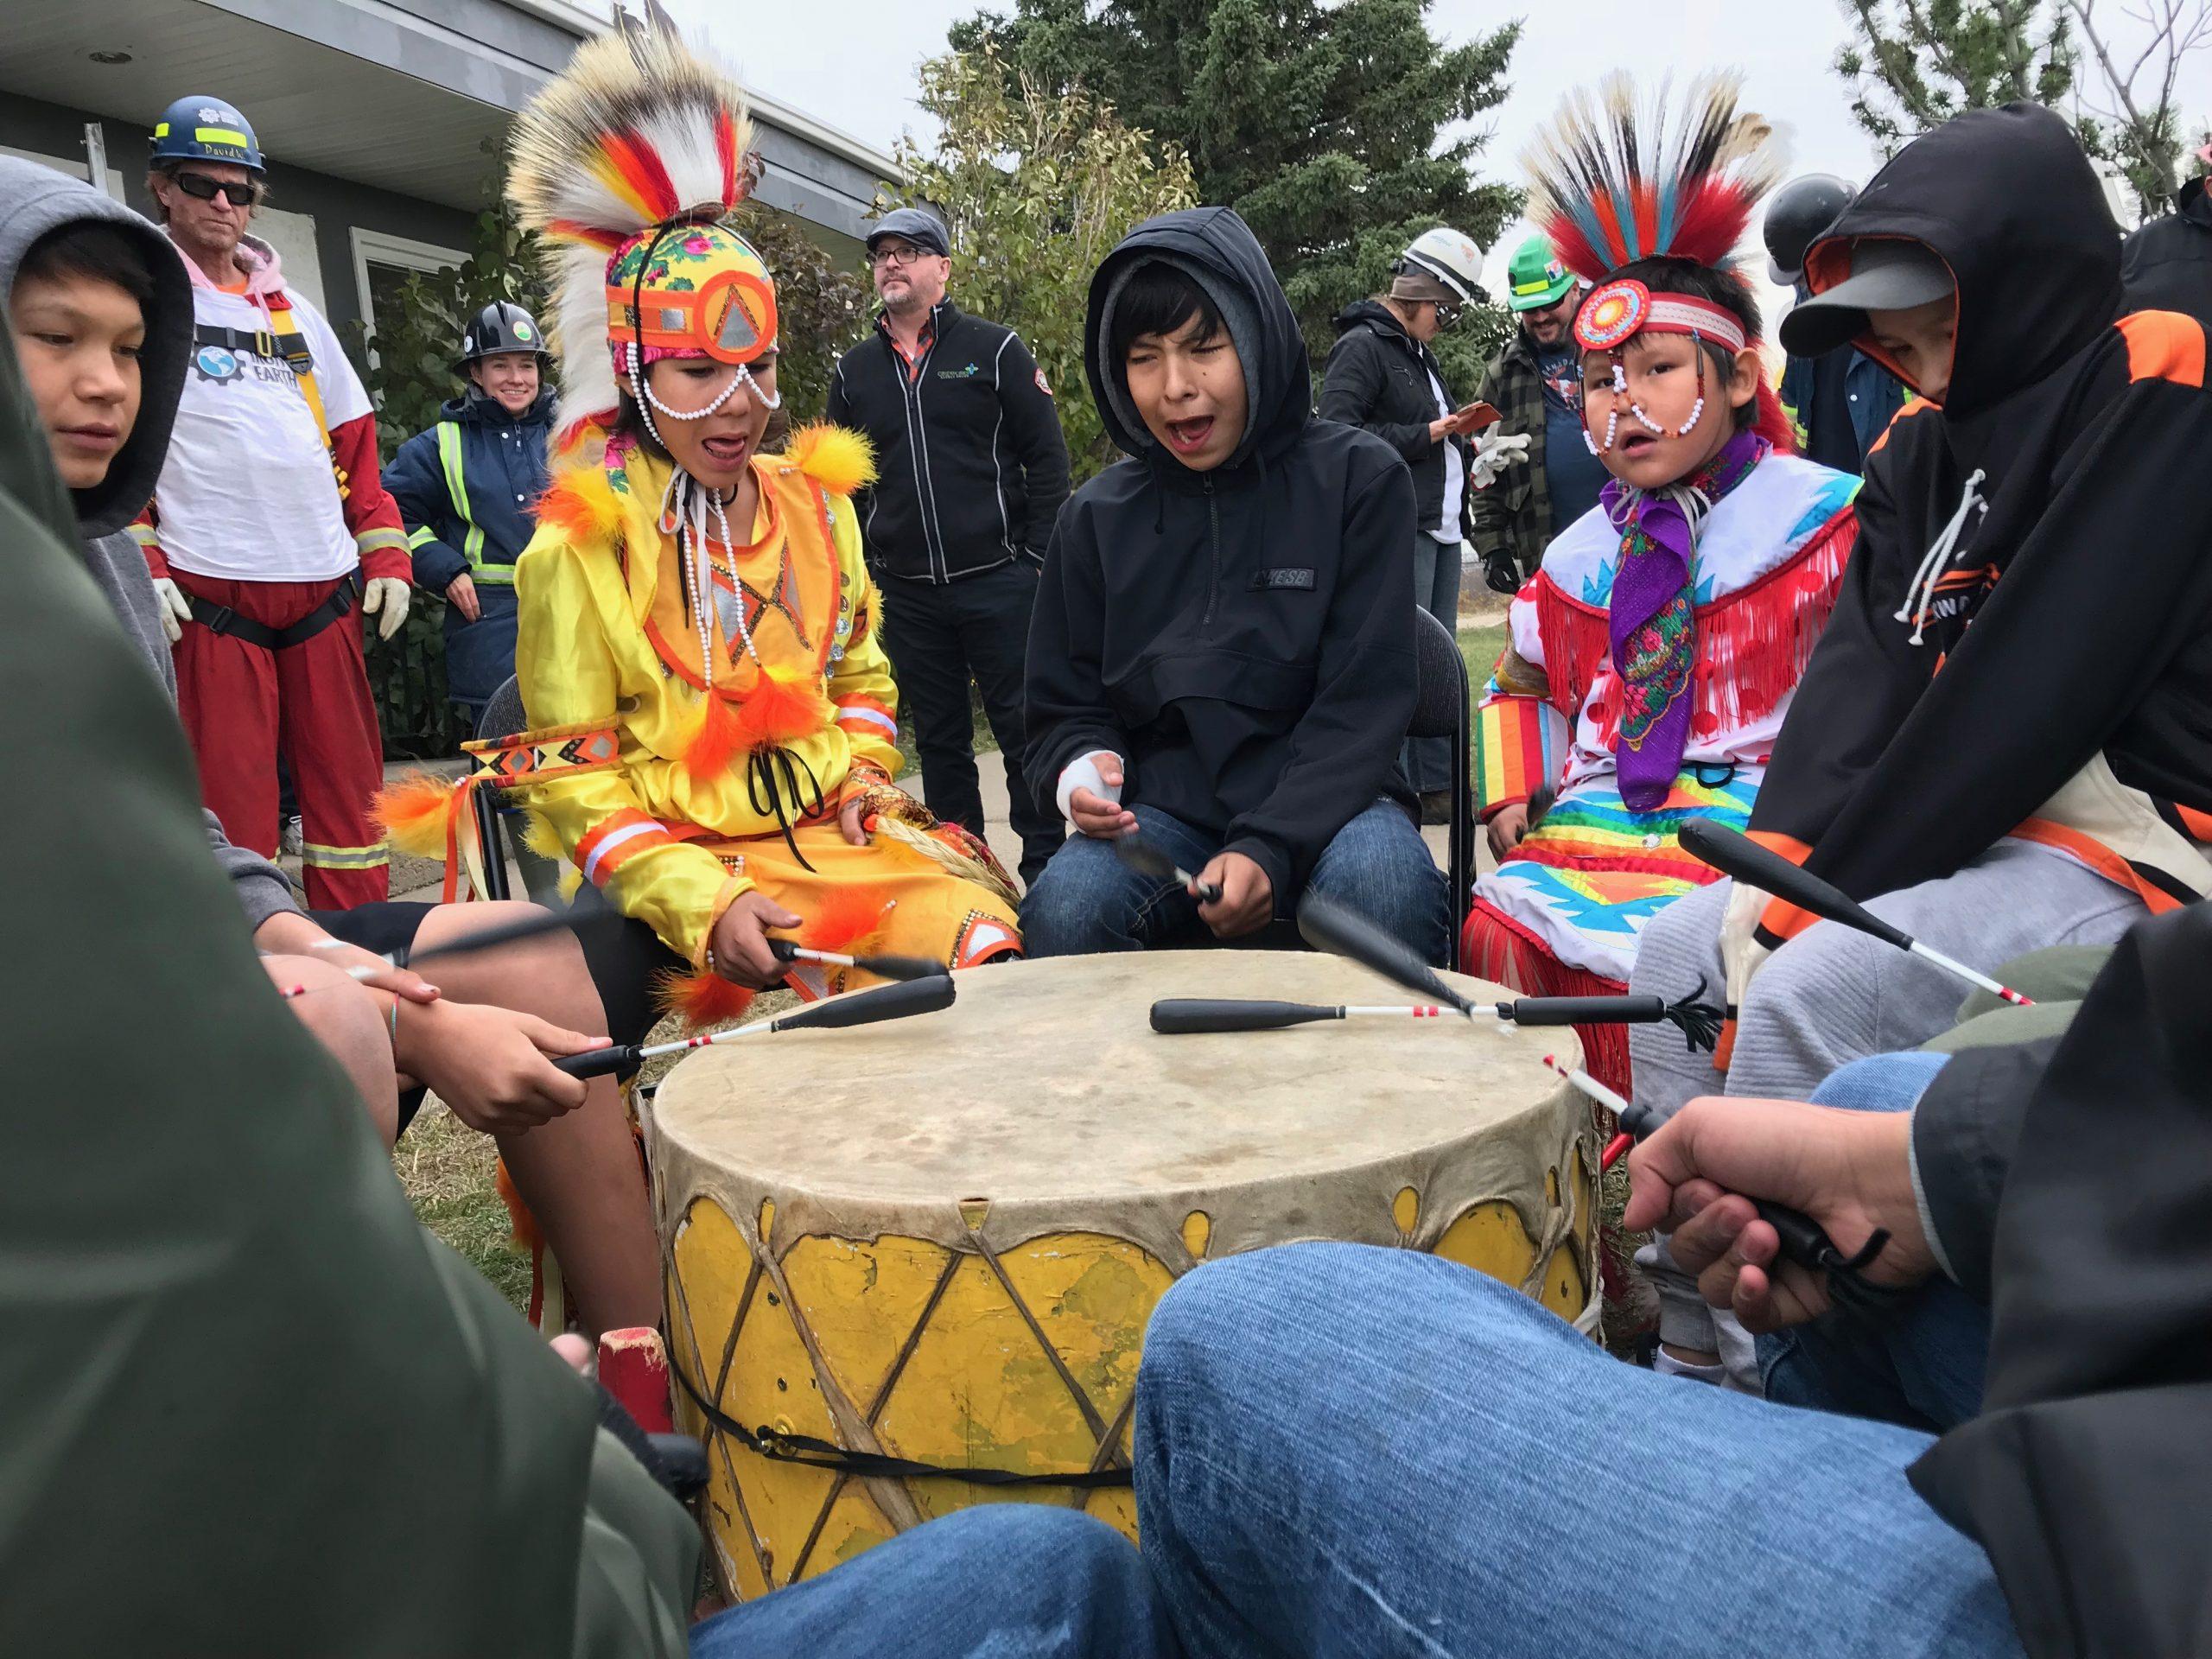 Youth Cultural Integration, Louis Bull IR, Alberta. Credits to: Green Energy Futures (CC BY-NC-SA 2.0) [183]